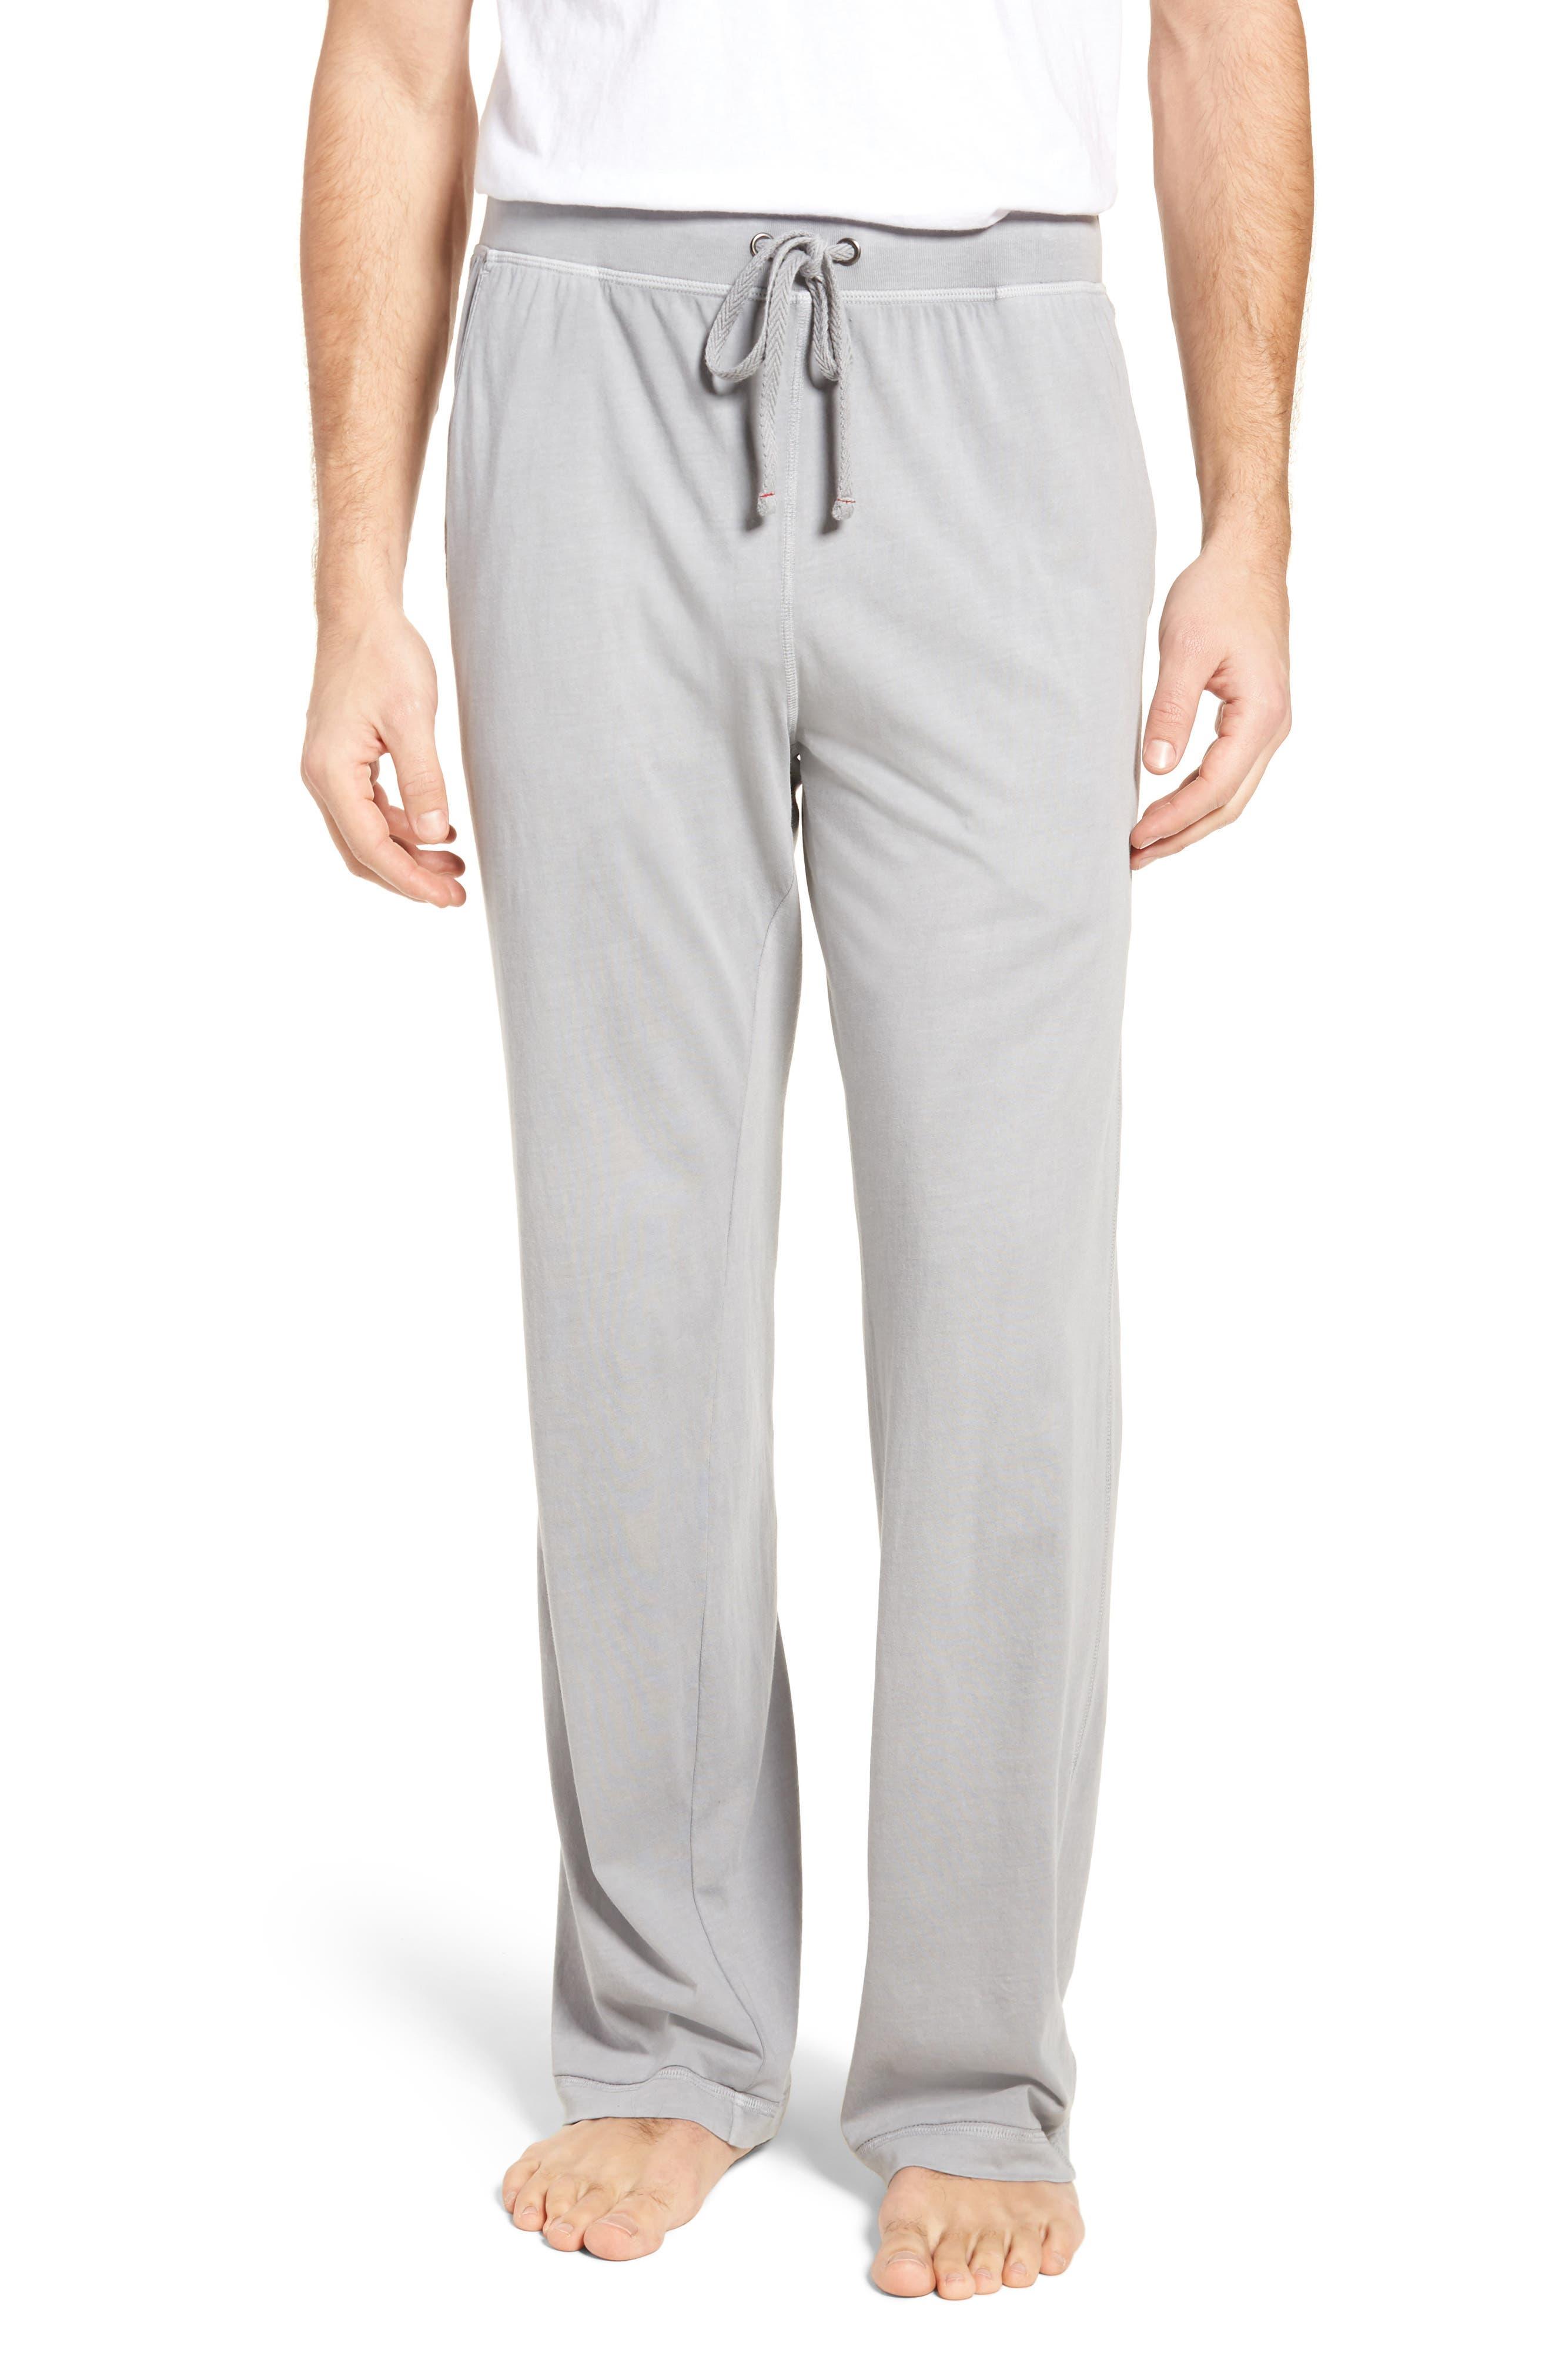 Peruvian Pima Cotton Lounge Pants,                         Main,                         color, Grey